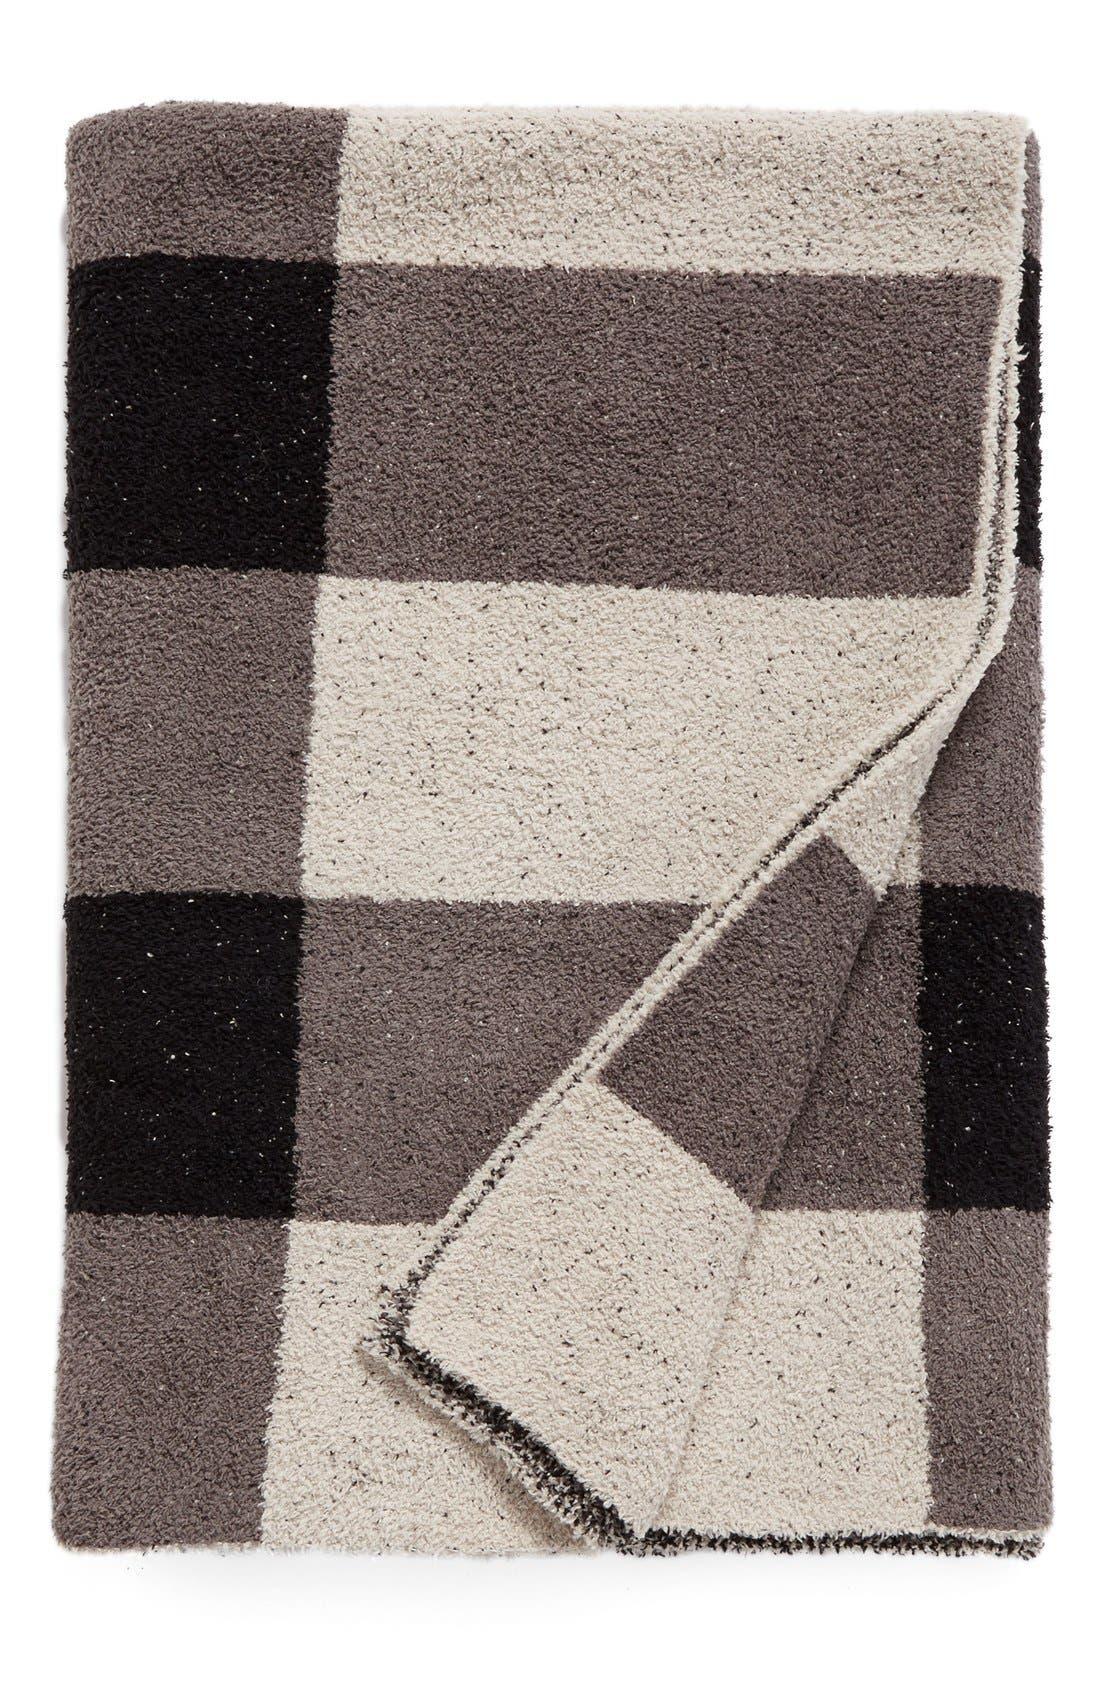 CozyChic<sup>®</sup> Plaid Throw Blanket,                             Main thumbnail 1, color,                             001